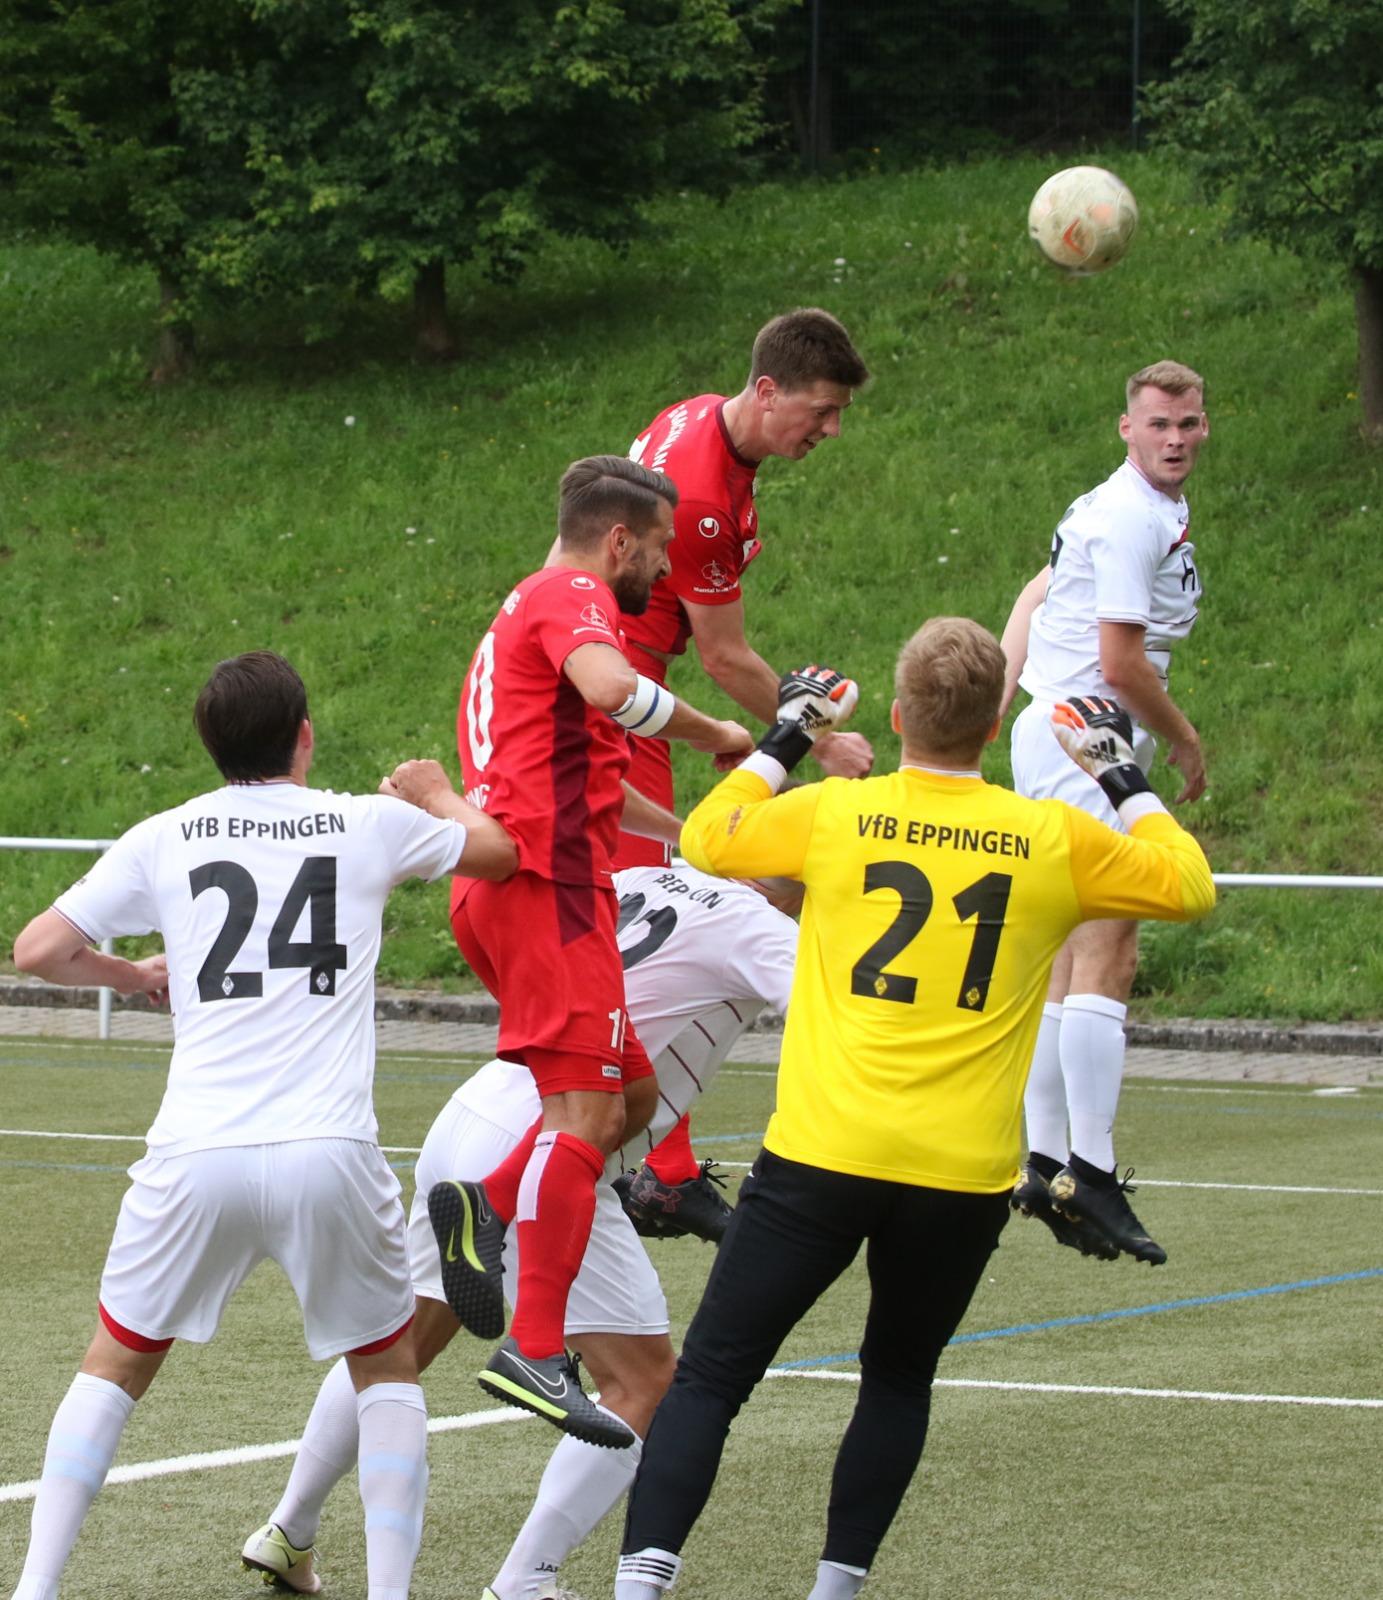 Herren1: Guter Test gegen den VfB Eppingen